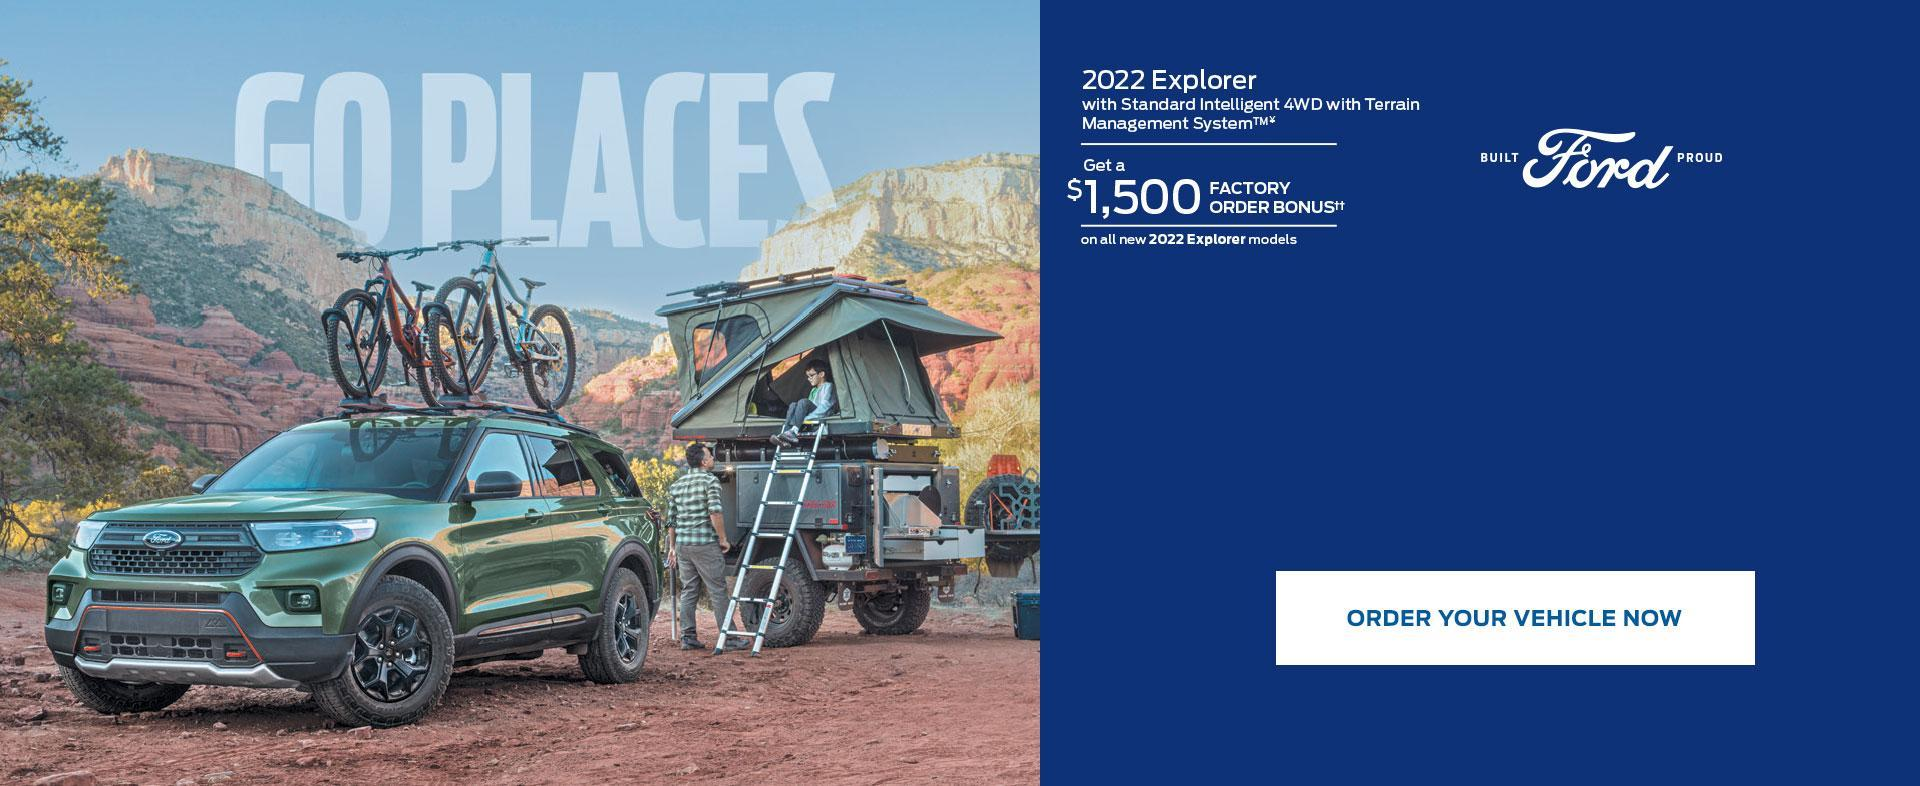 2022 Ford Explorer | Factory Order Bonus | Ford of Canada